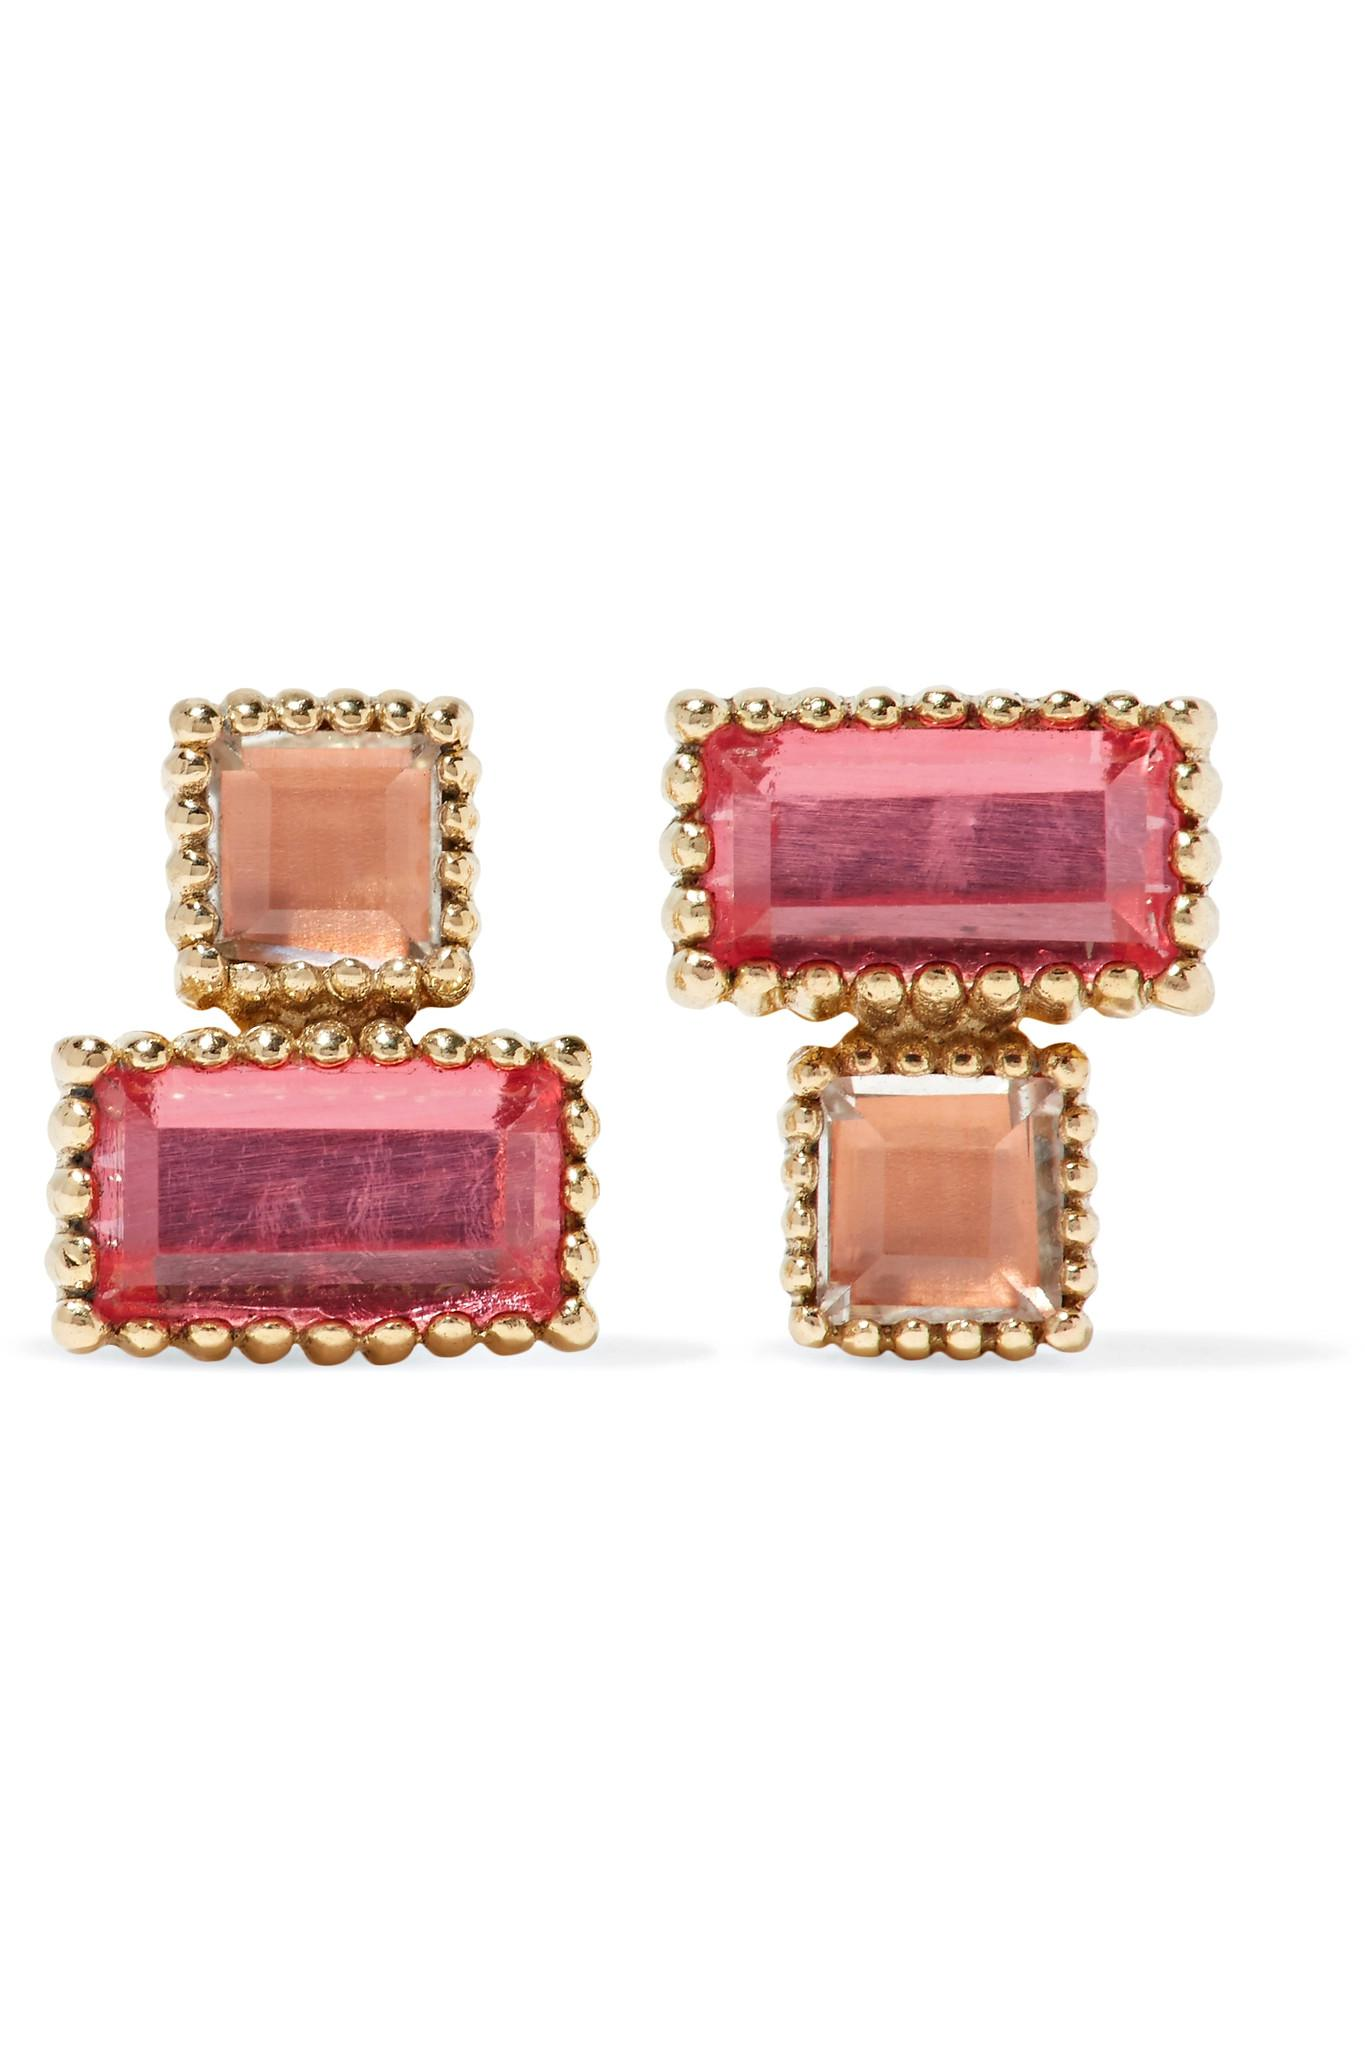 Larkspur & Hawk Cora 14-karat Gold Quartz Earrings ELGLrytE